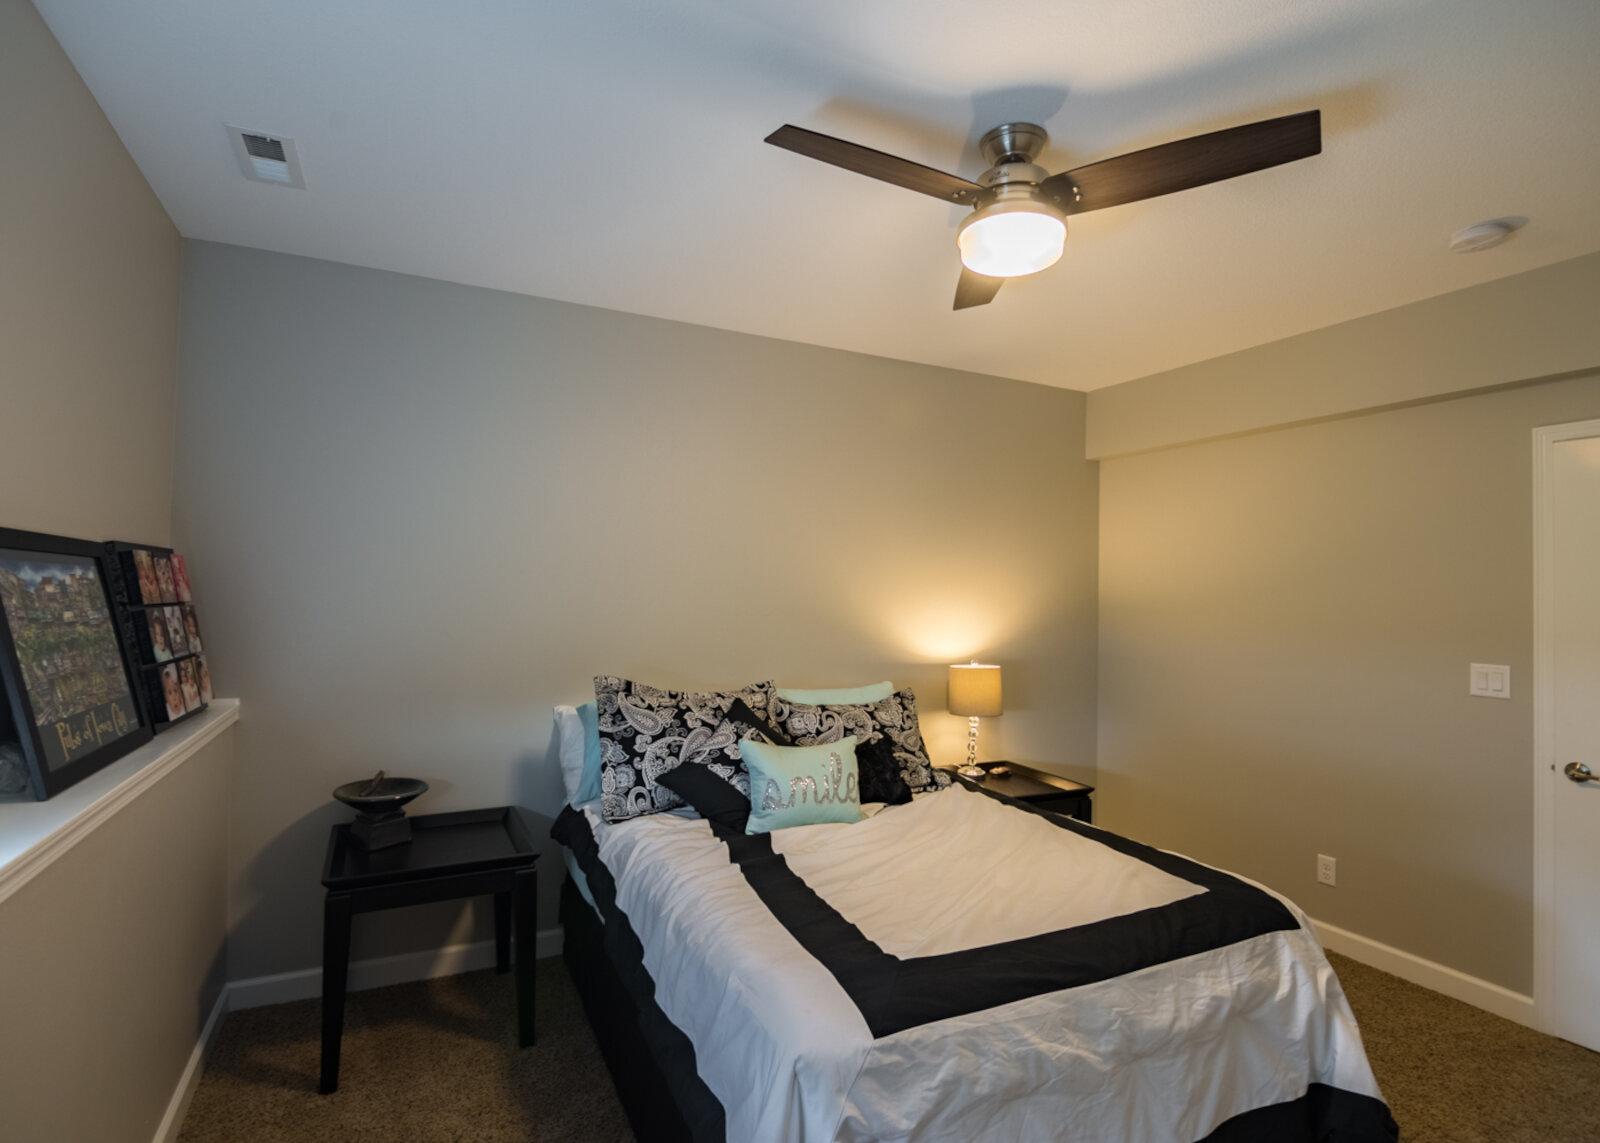 Detached Bedroom Additions